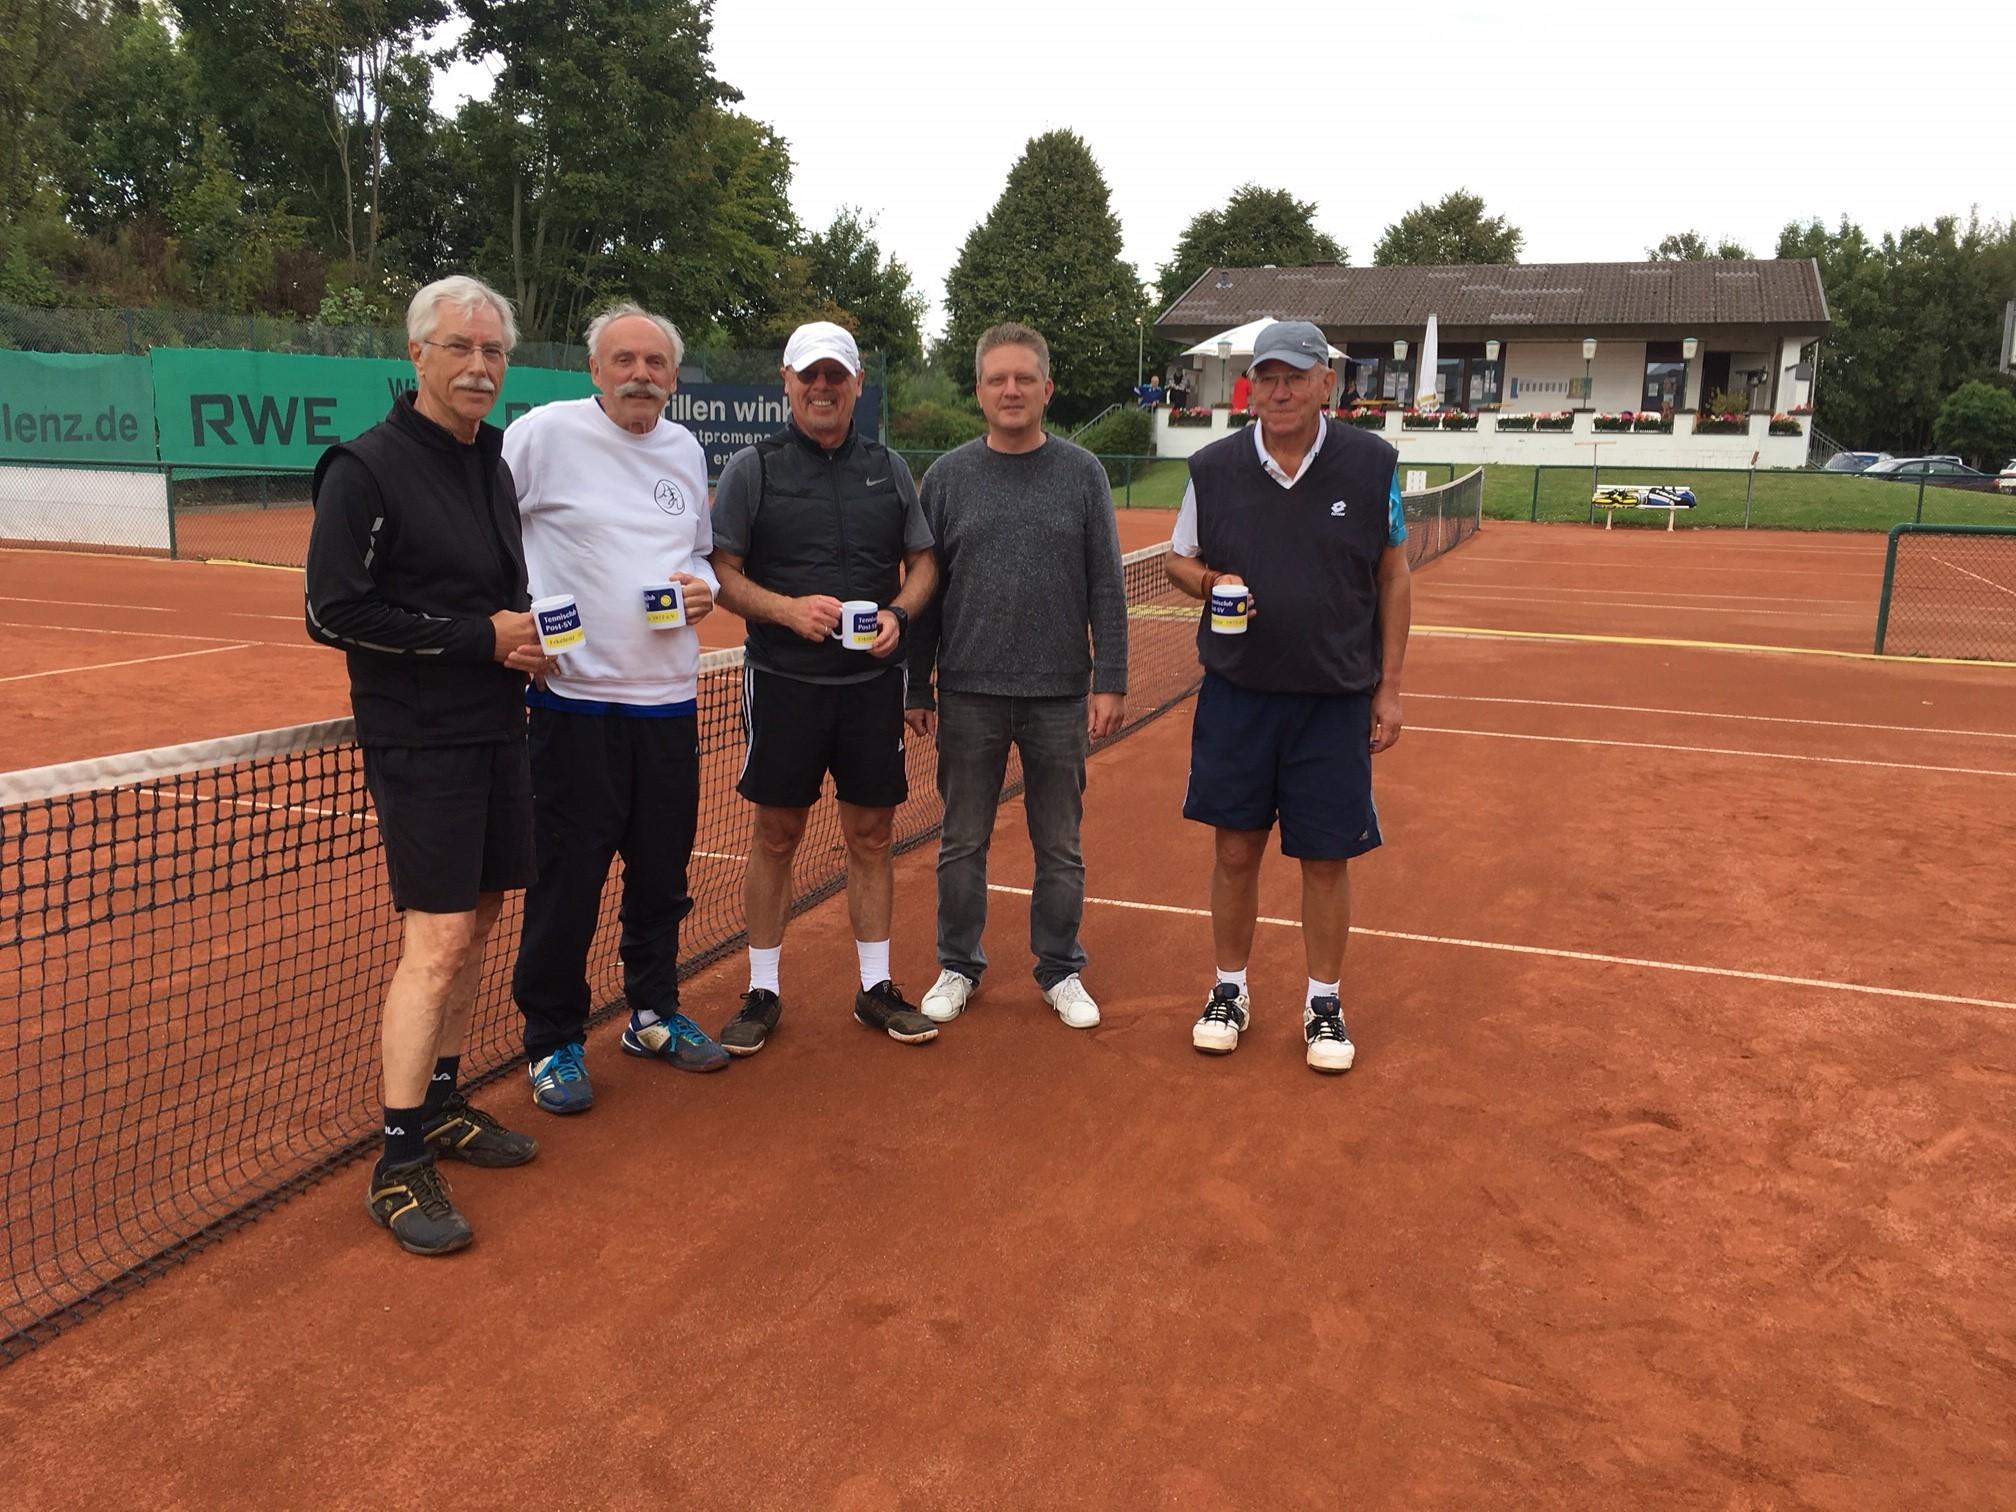 v.l. Wolfgang Weuthen, Roland Jaspers, Herbert Fervers, Dominik Peters, Peter Maßen